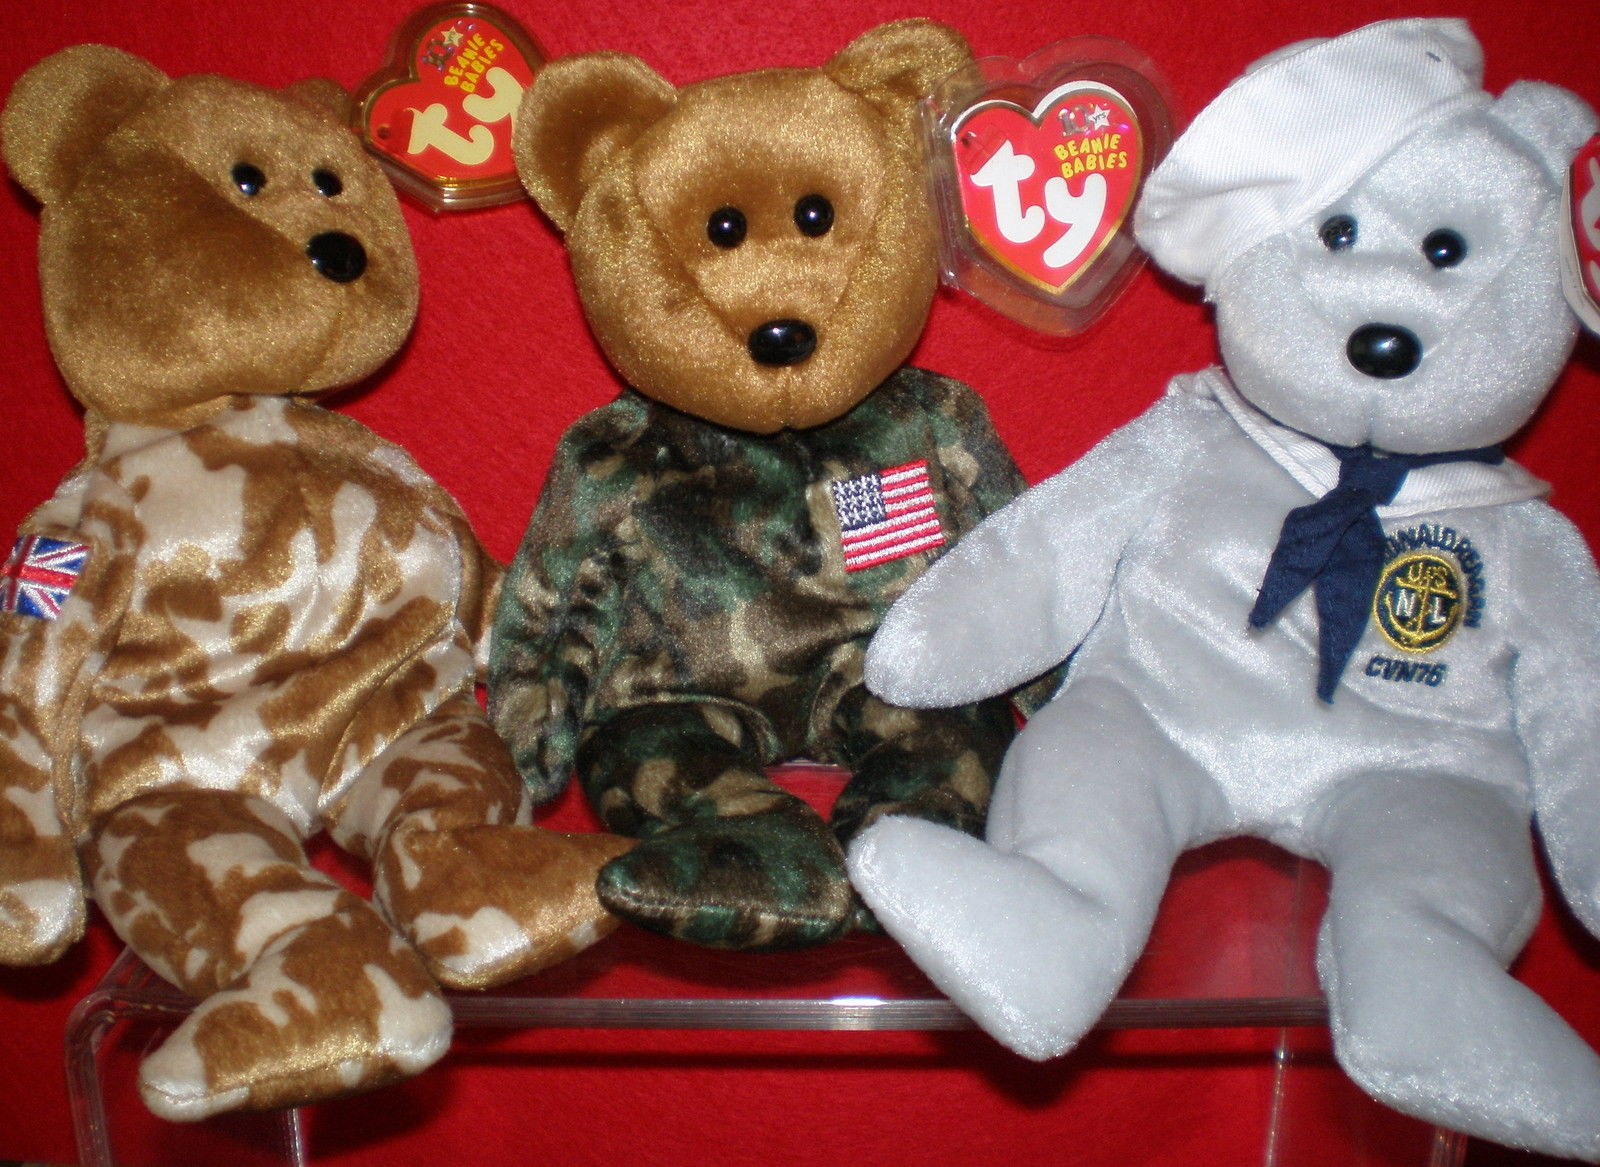 ee818856230 Ty Beanie Baby 3 Patrioric Bears 2 Flag and 50 similar items